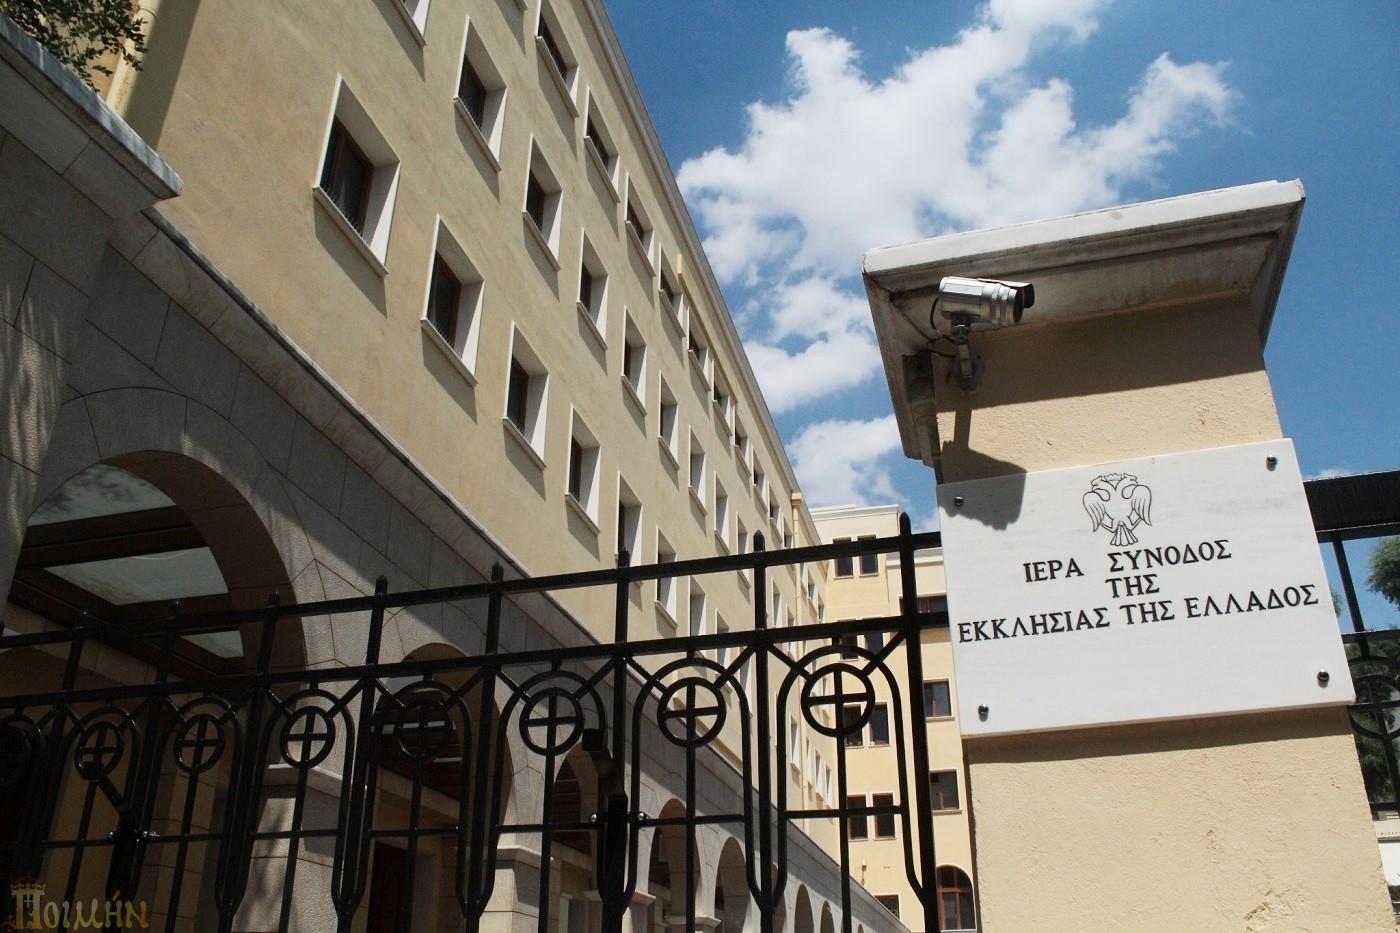 EKTAKTO: Ιερέας επιτέθηκε με βιτριόλι σε Μητροπολίτες